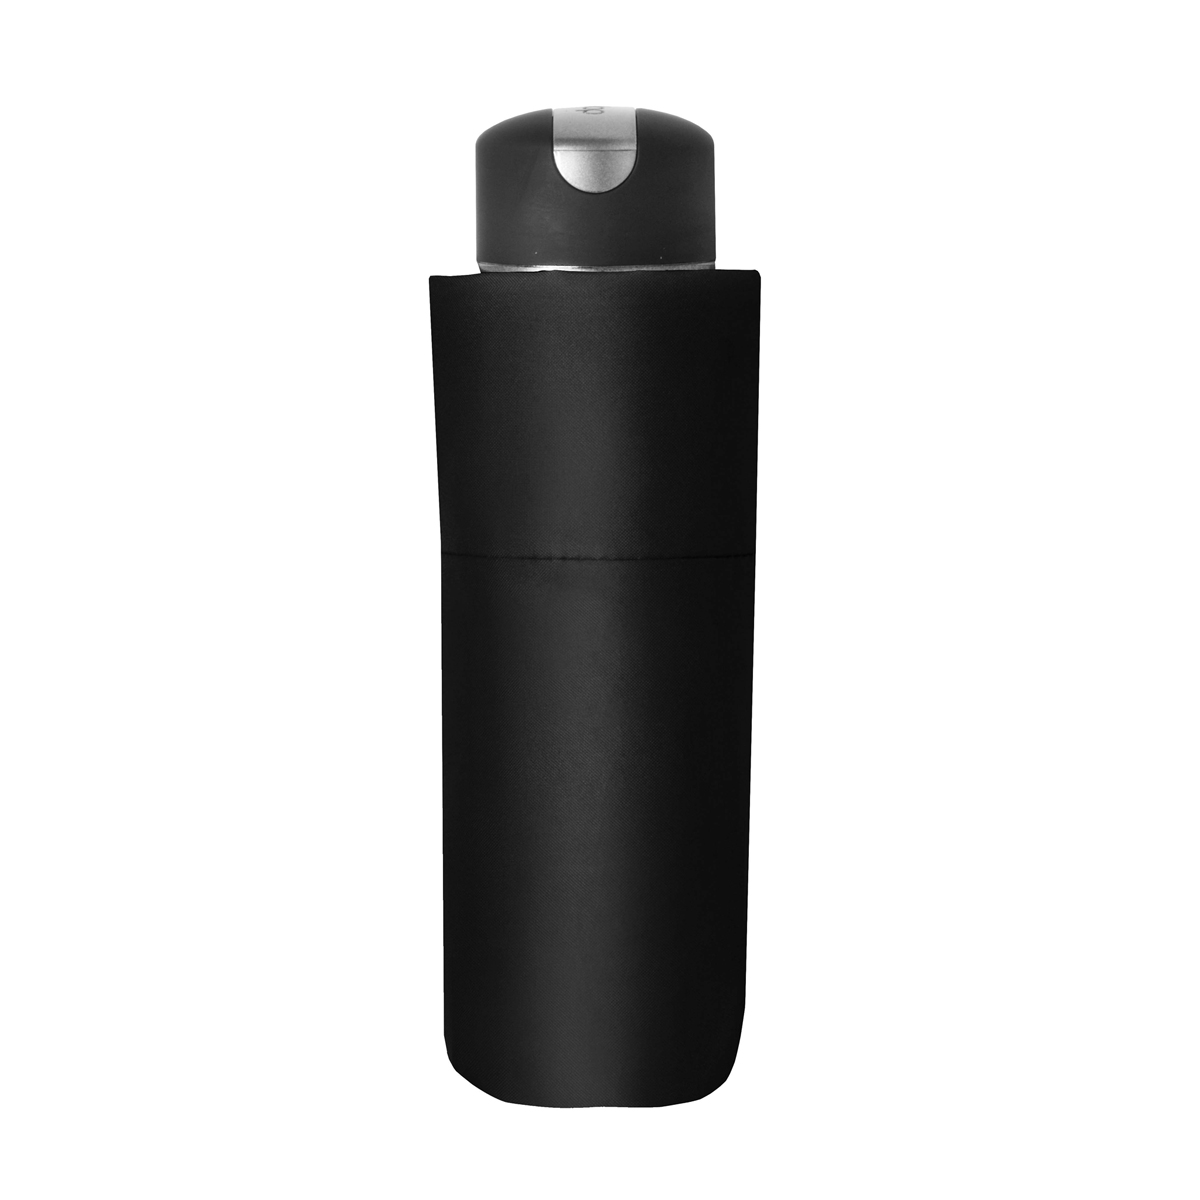 Doppler Mini XS Carbonsteel černý - skládací mini deštník